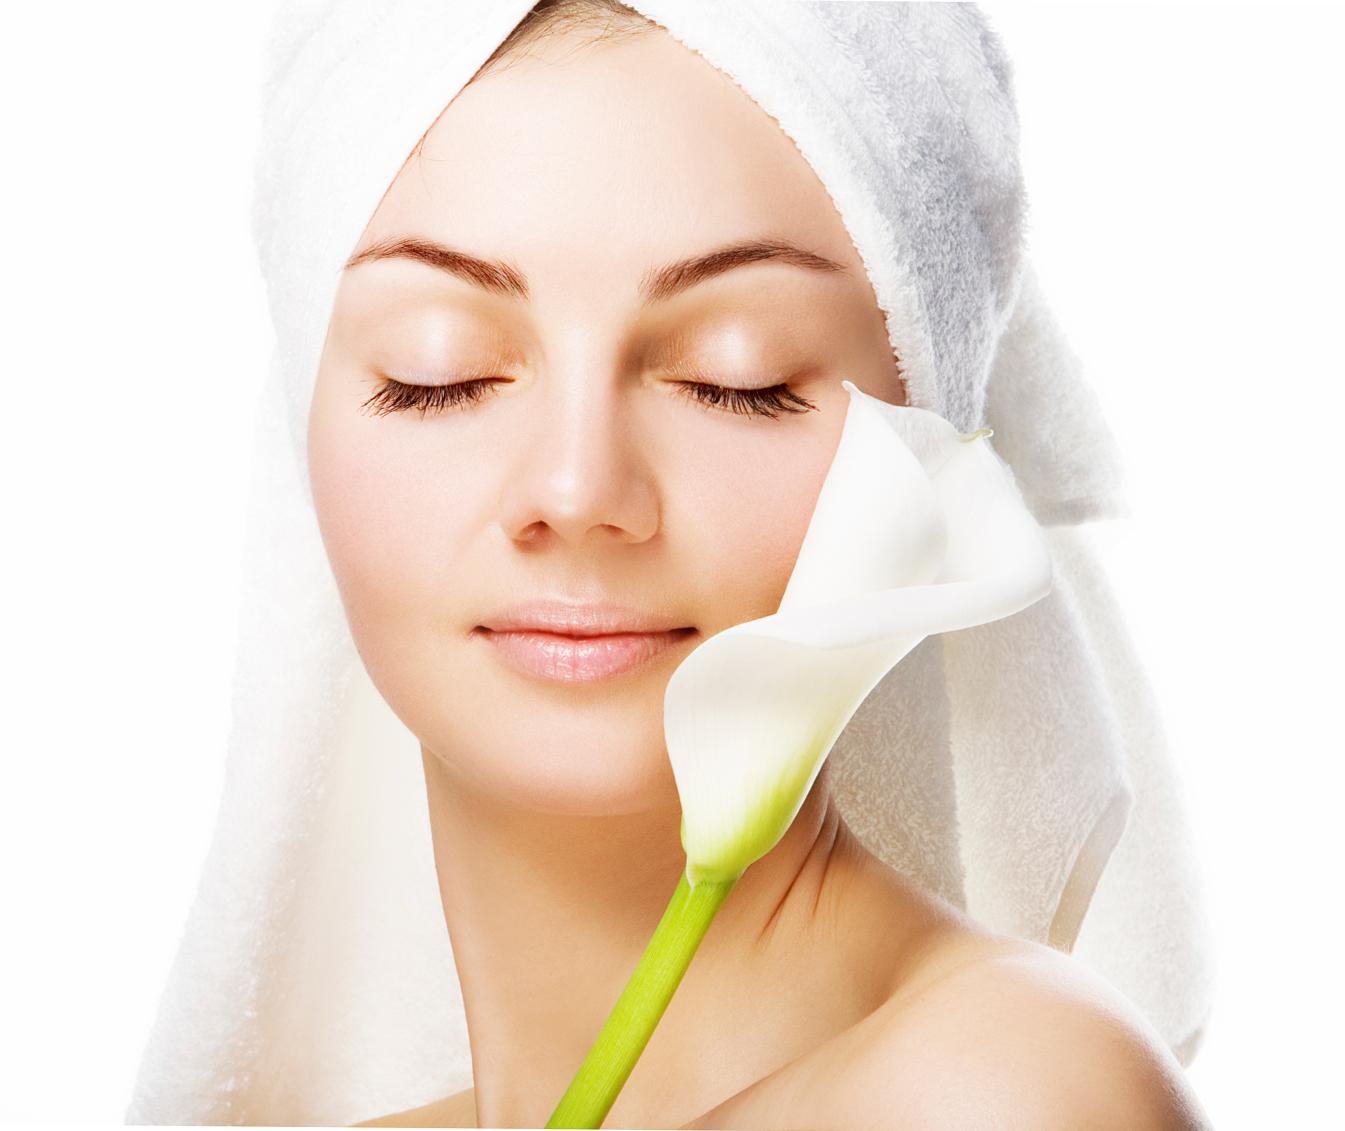 PunjabKesari, Glowing Skin Image, Saffron Water Image, केसर वाला पानी इमेज, केसर के फायदे इमेज